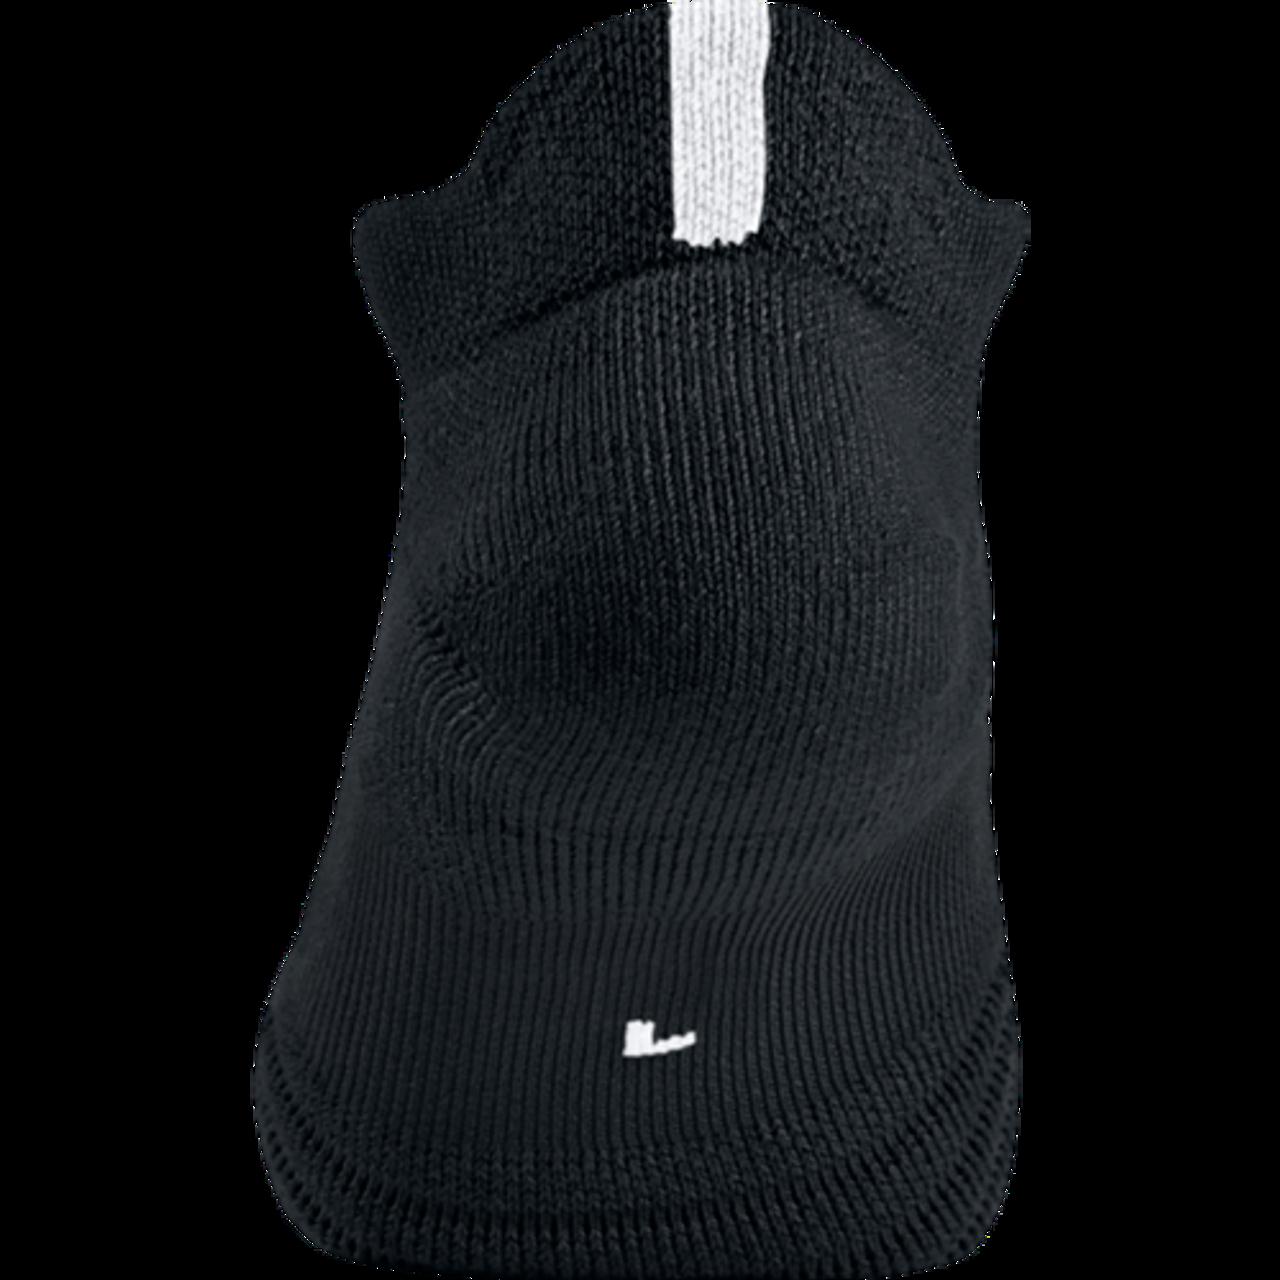 64ed70176ef Nike Elite Versatility Low Basketball Sock - Black Black Anthracite